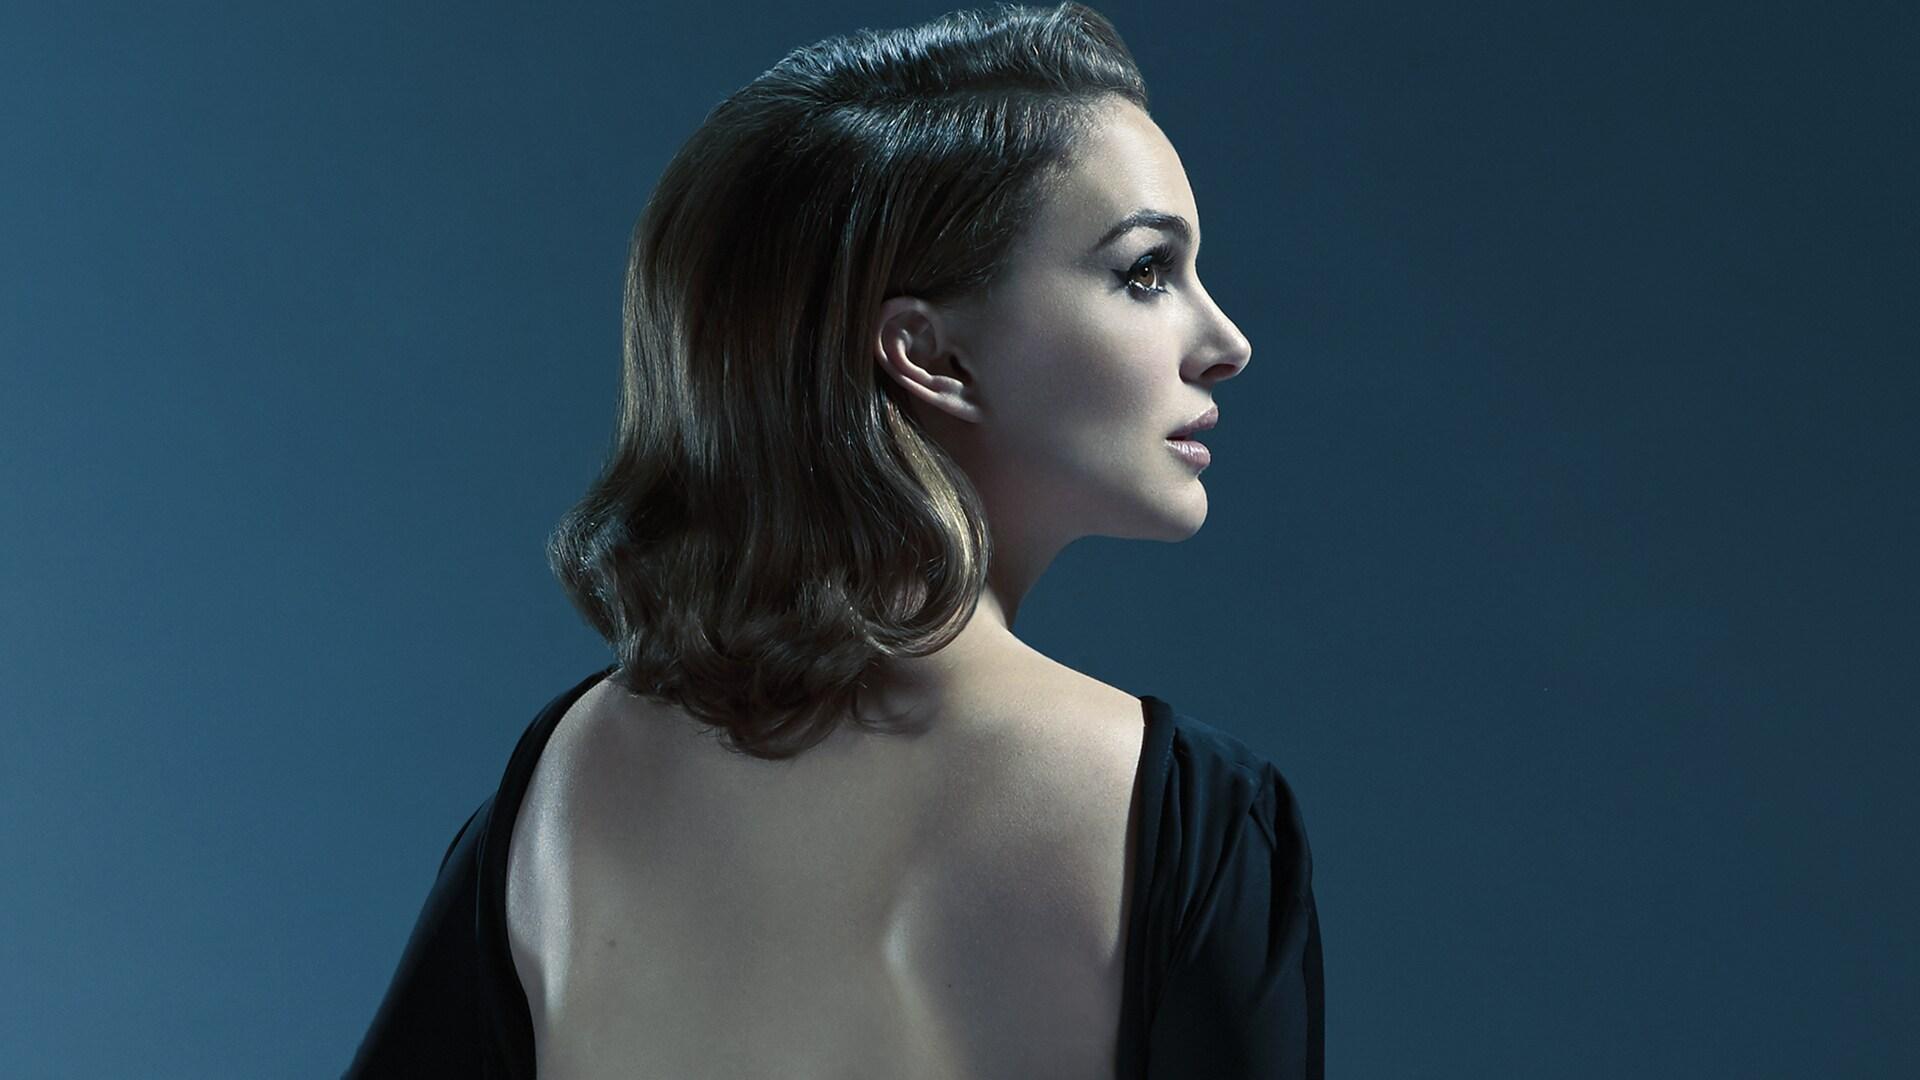 Natalie Portman: February 3, 2018